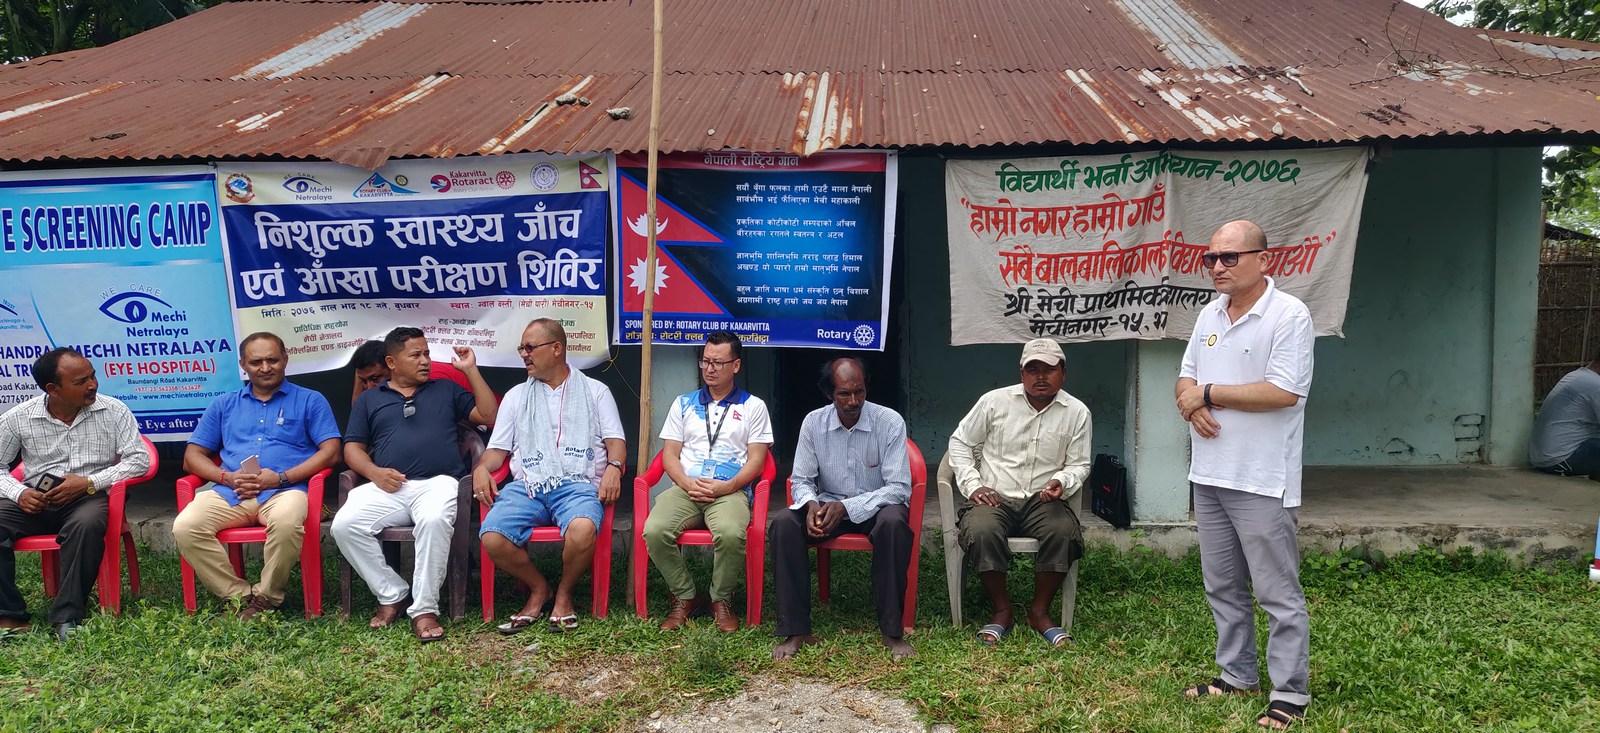 Free-Health-Camp-Eye-Screening-at-Gwala-Basti-Mechinagar-15-Jhapa-Nepal-Rotary-Club-of-Kakarvitta-17